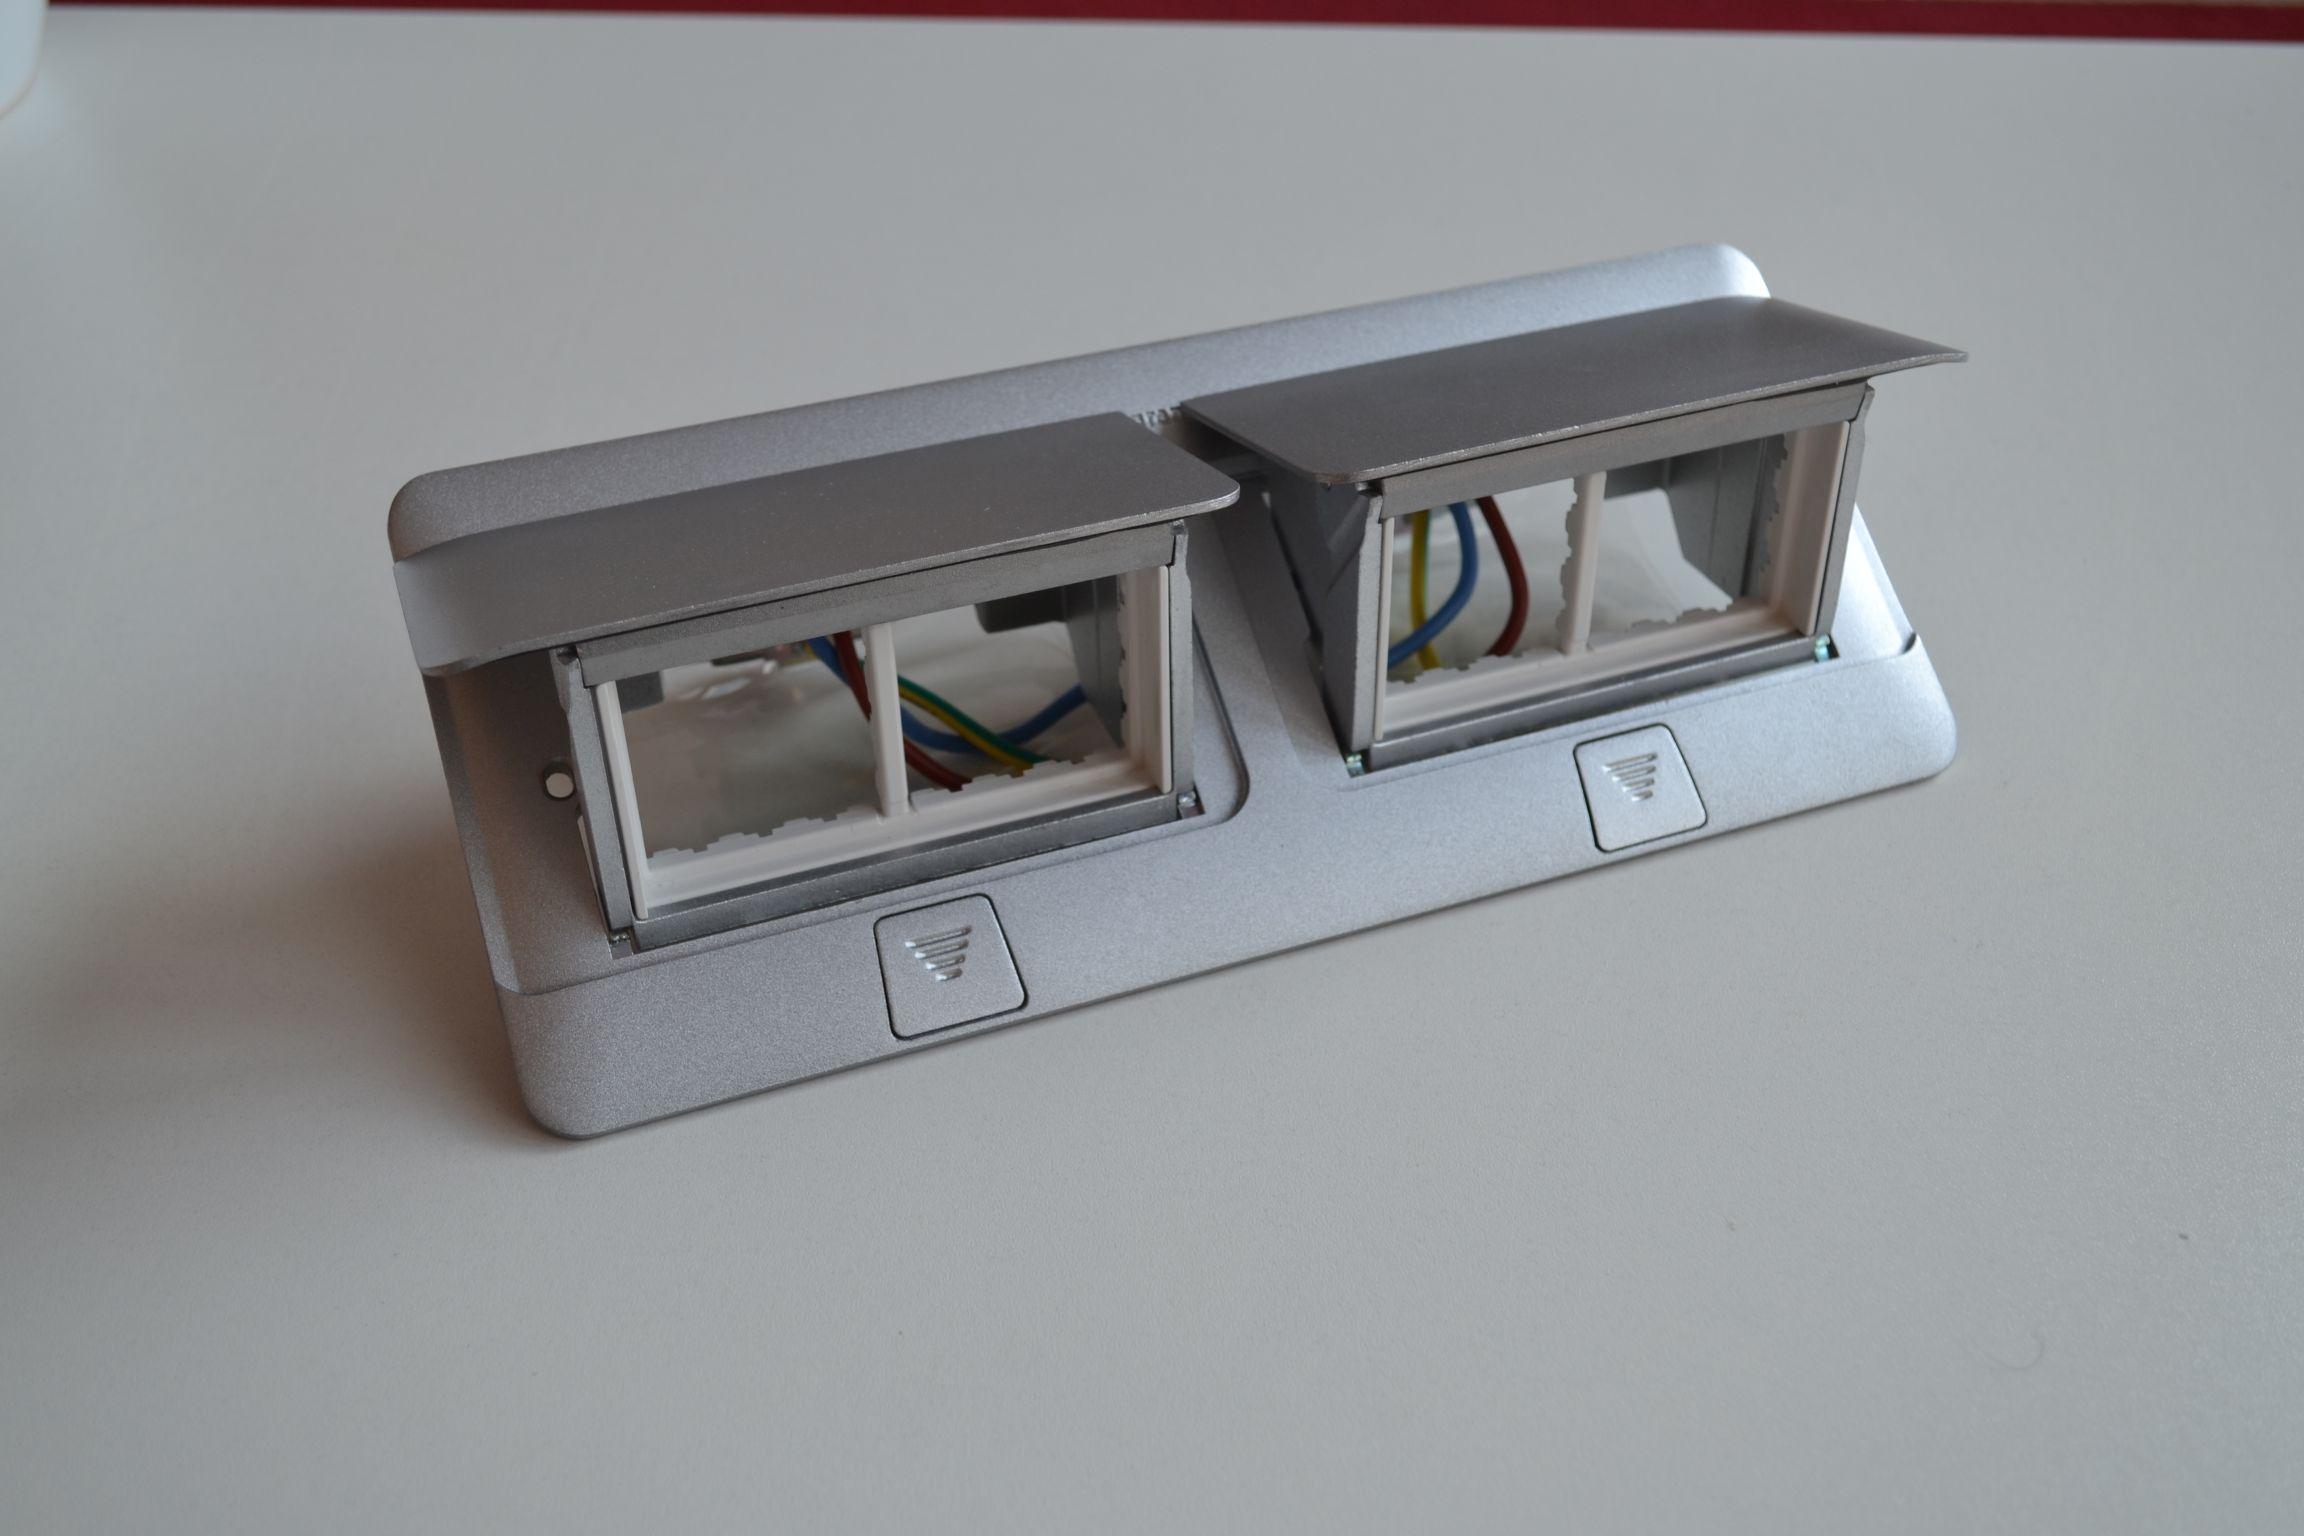 POPUP matný hliník 2x4 moduly